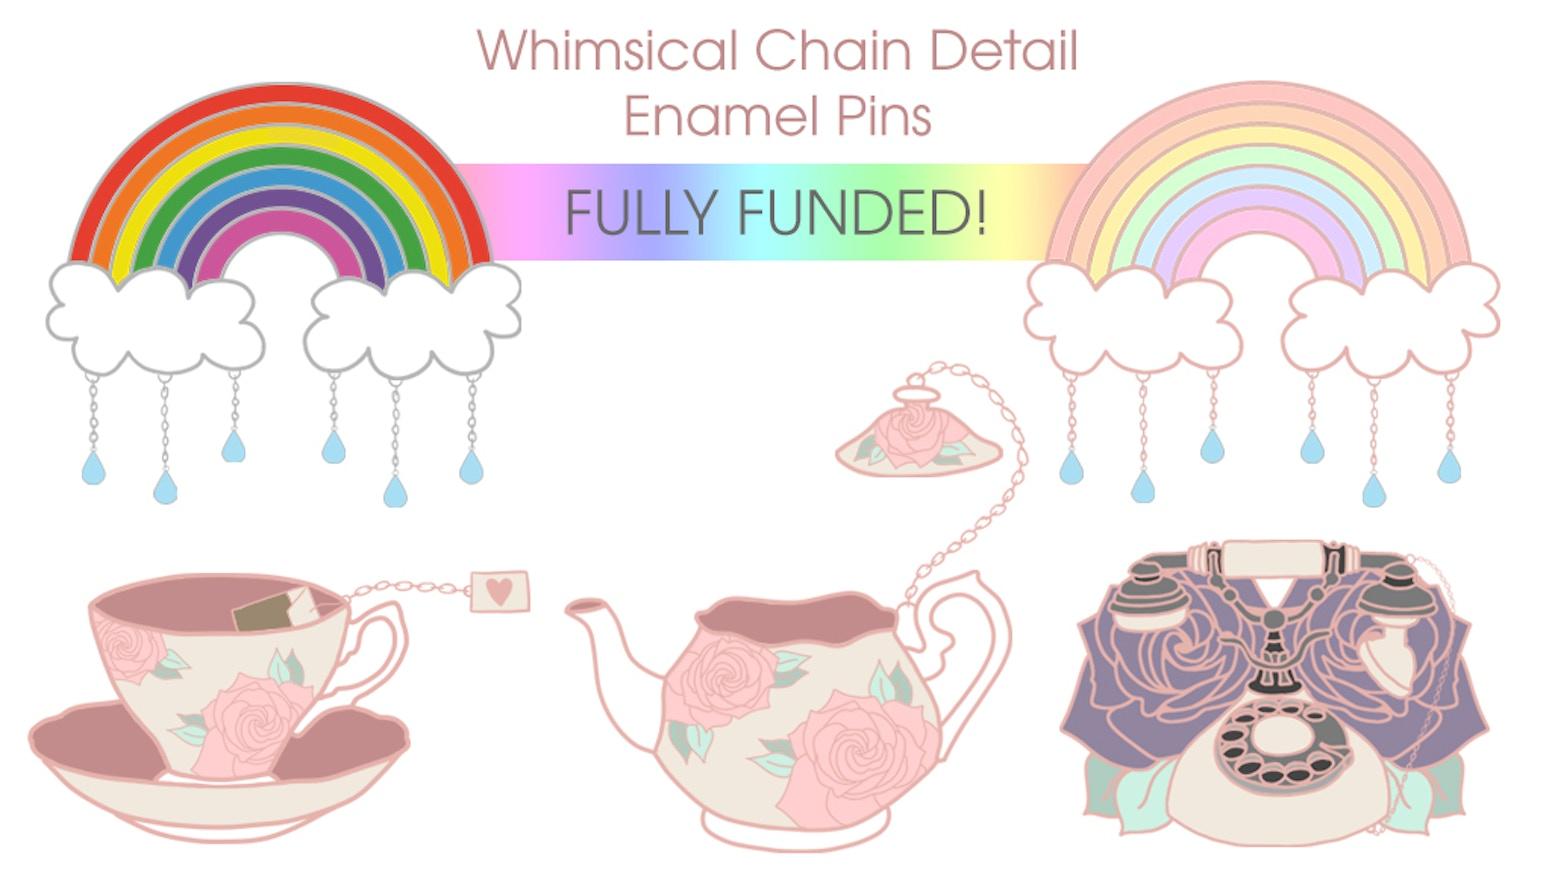 Rainbow & Raindrops Enamel Pin + Stretch Goals by Kirsty Hampson —  Kickstarter